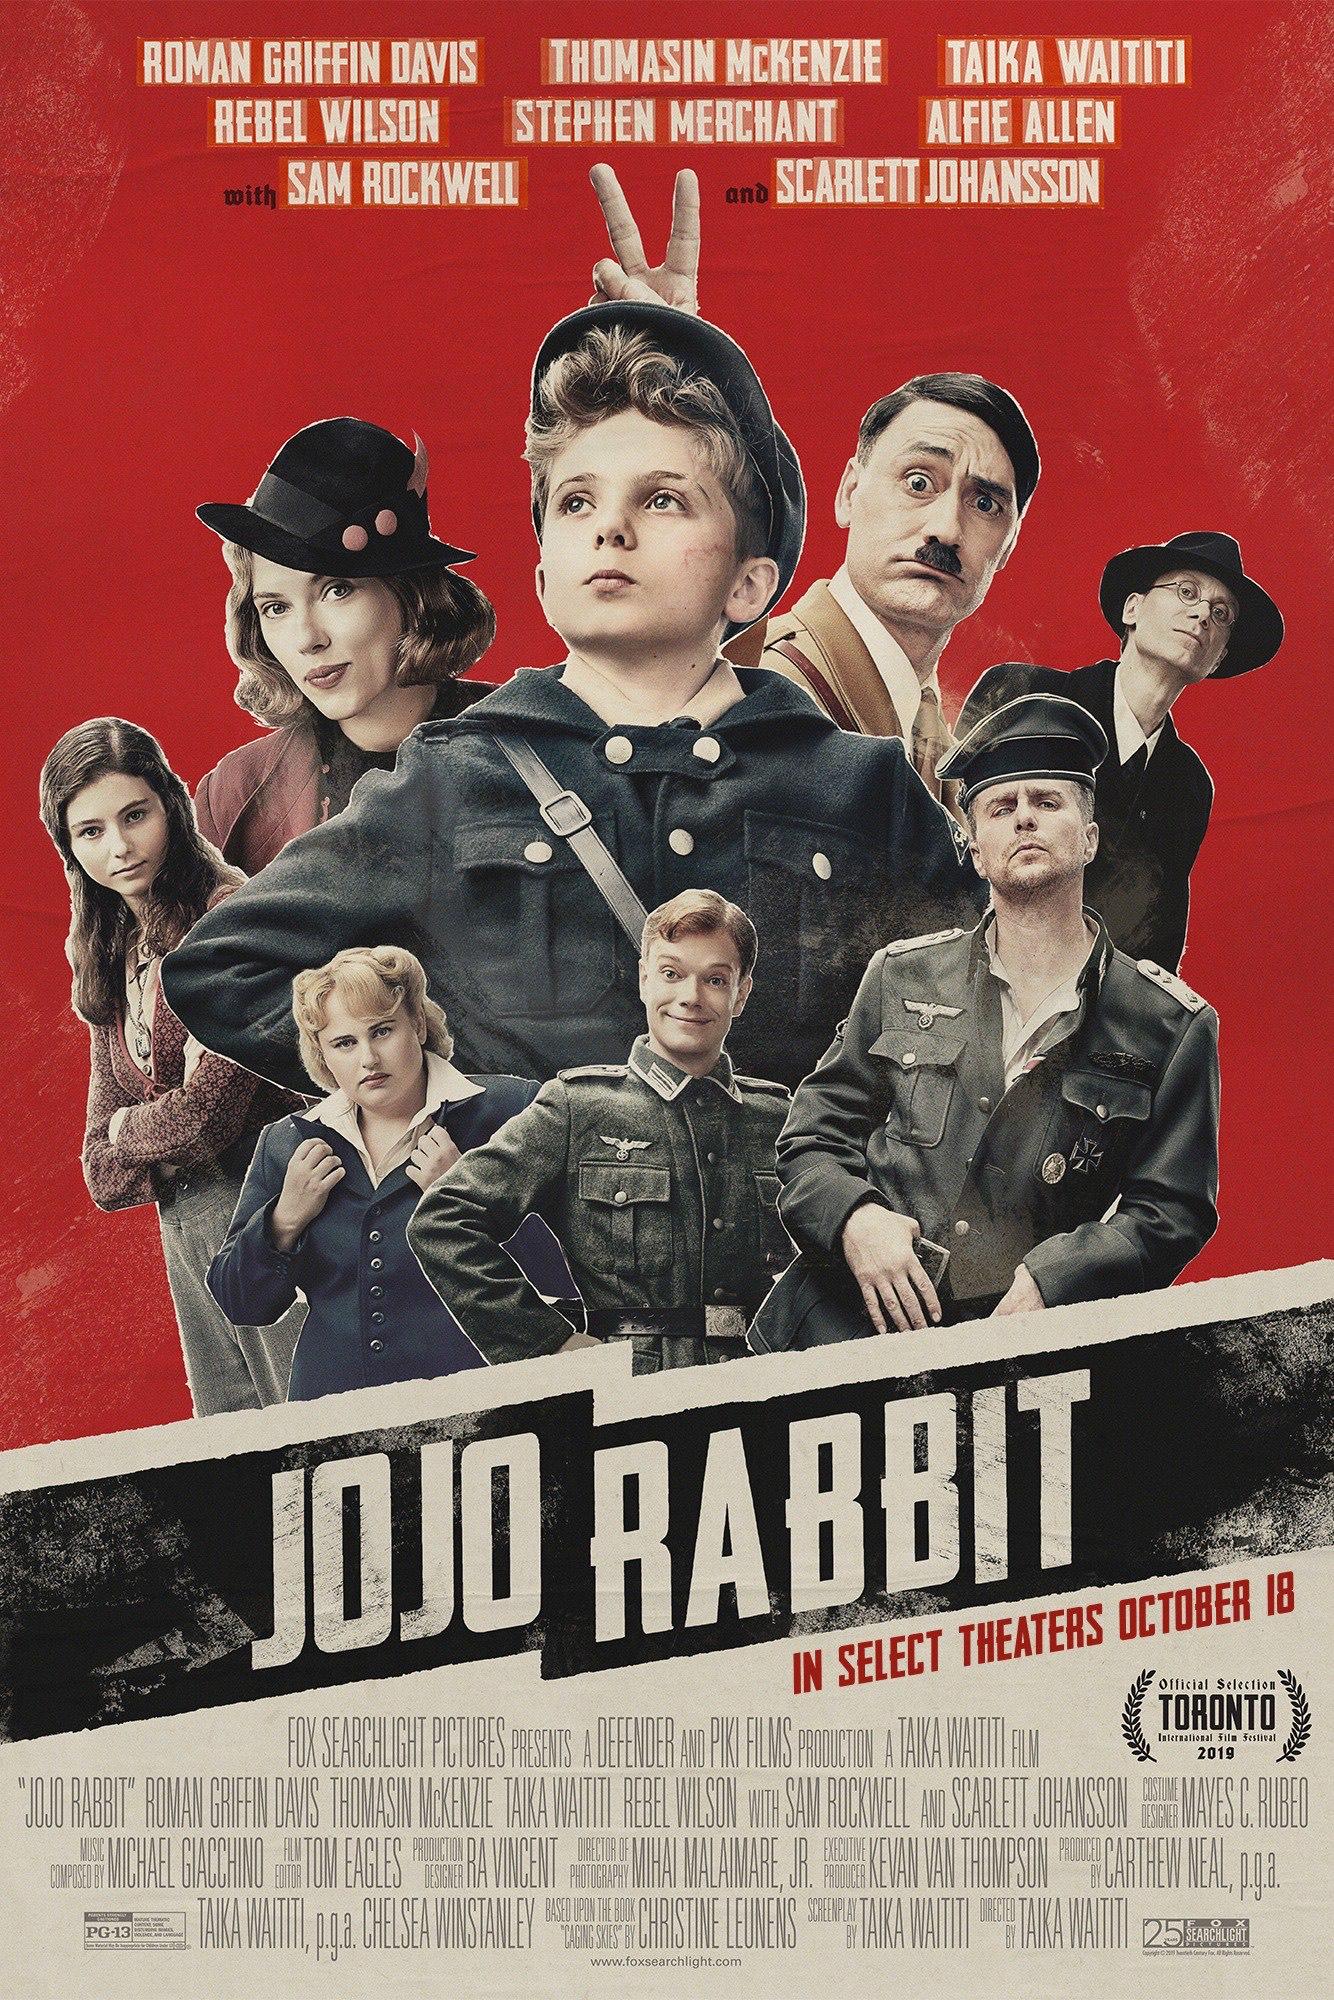 Jojo Rabbit für 3,89€/4,99€ HD/4K [Amazon]/[iTunes]